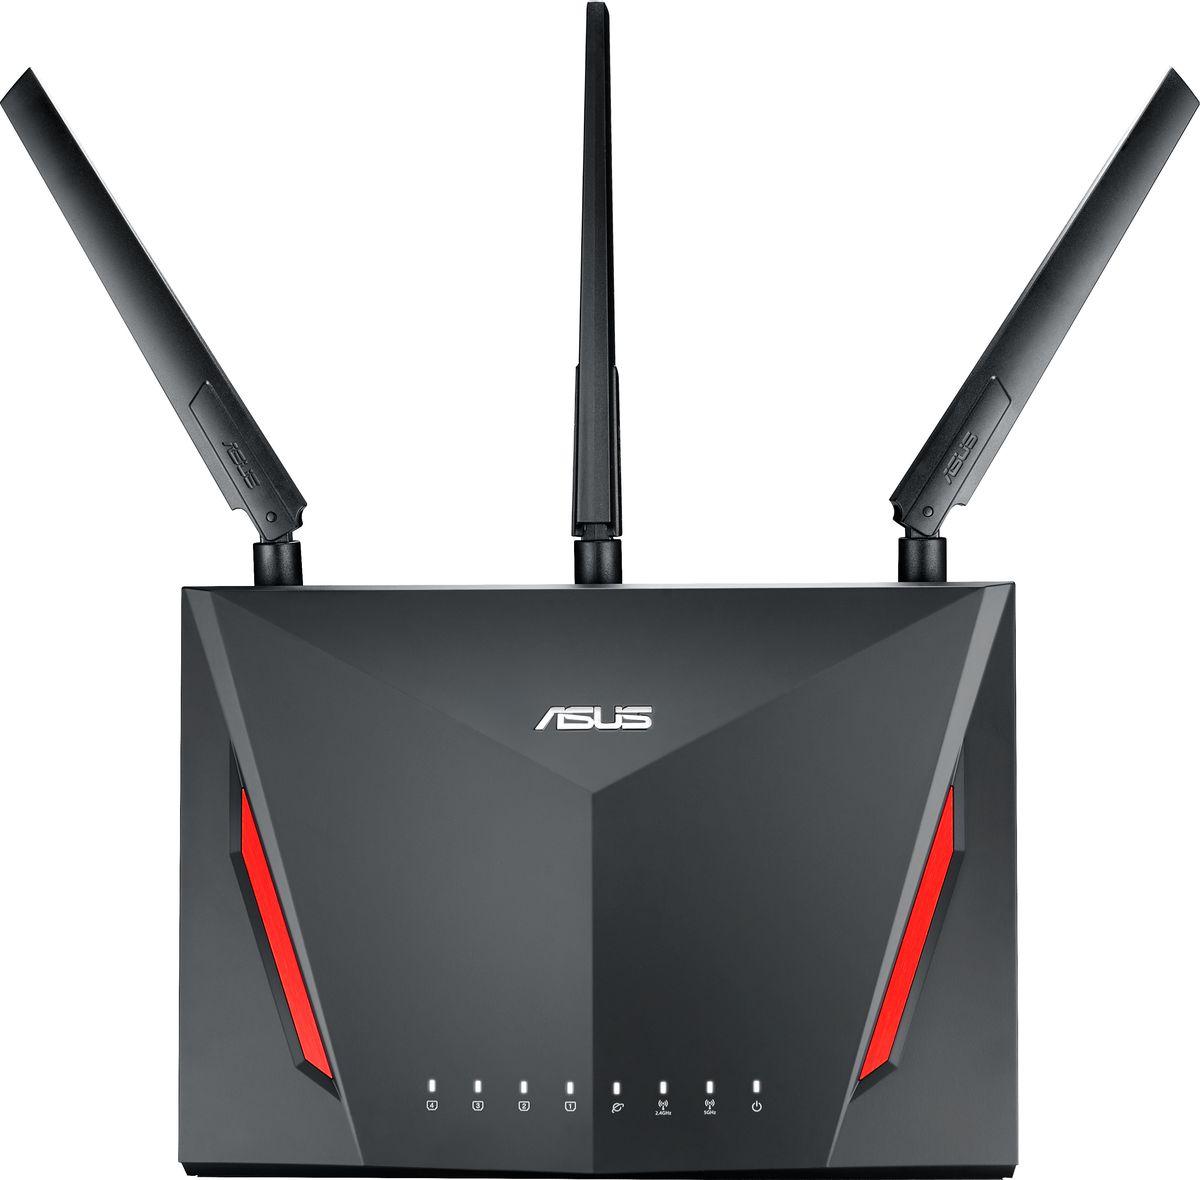 ASUS RT-AC86U маршрутизатор